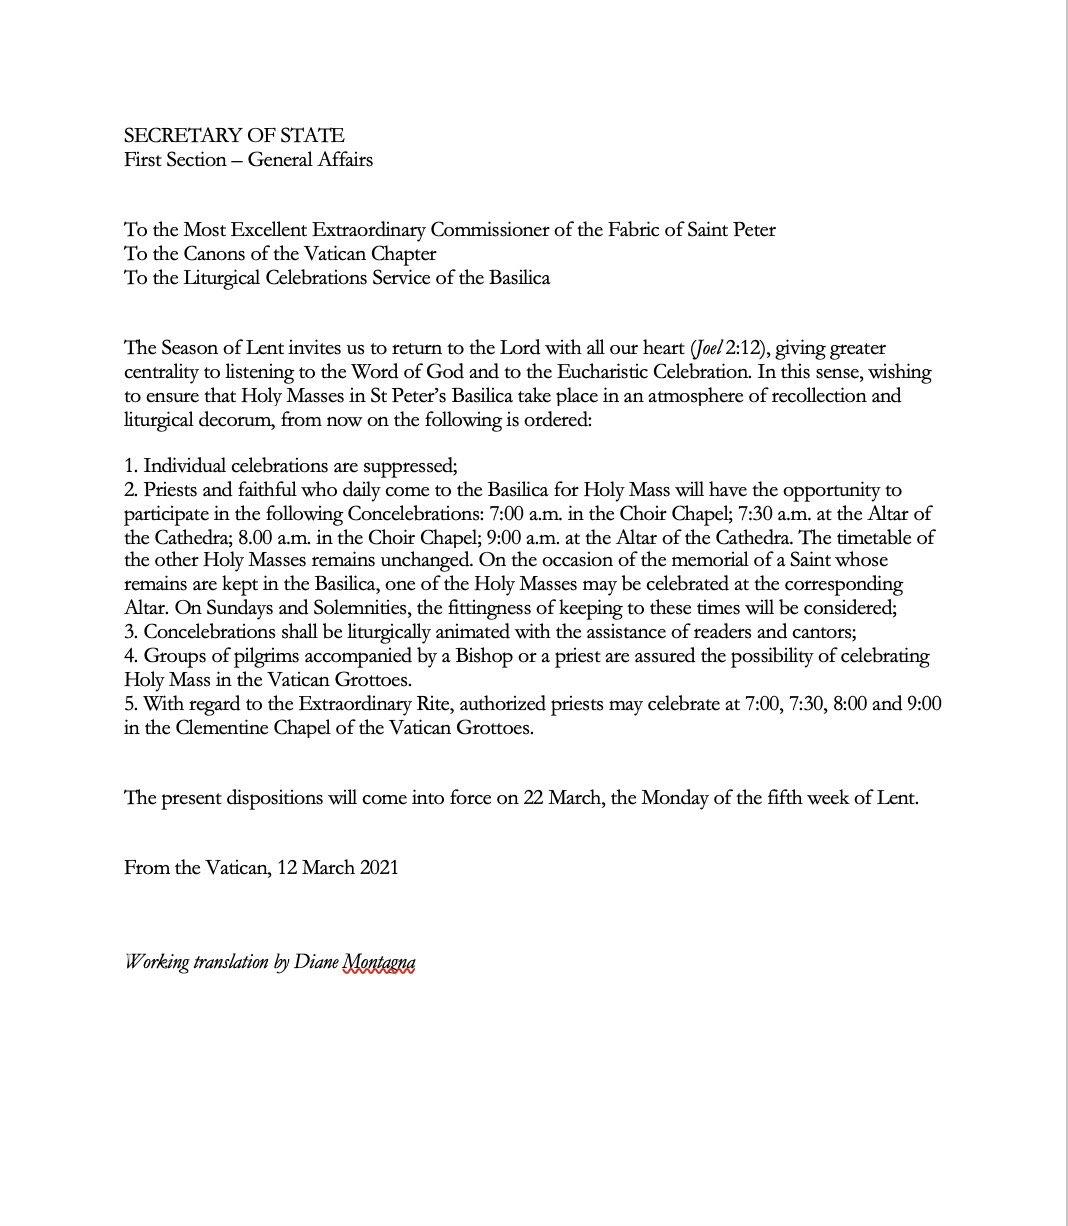 Vatican bans TLM in St Peters